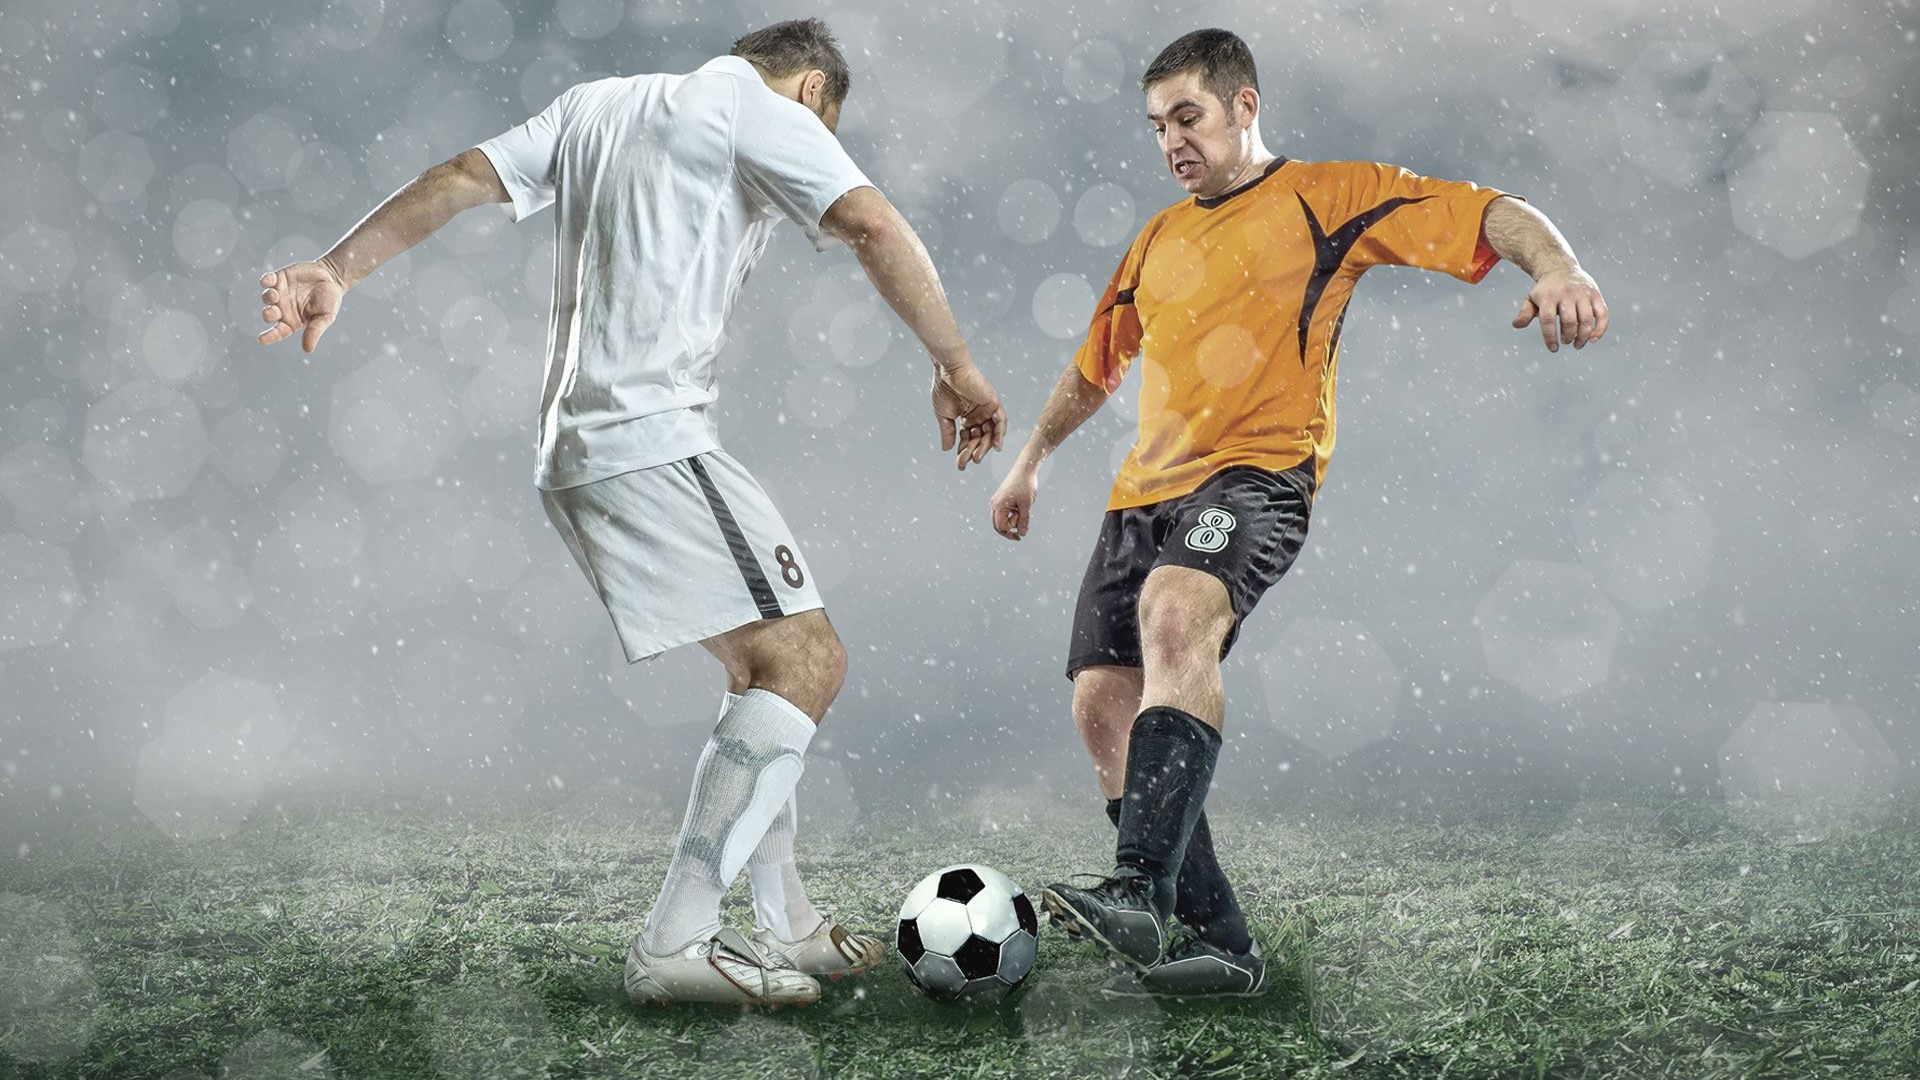 northampton-vs-newcastle-falcons-rugby-live